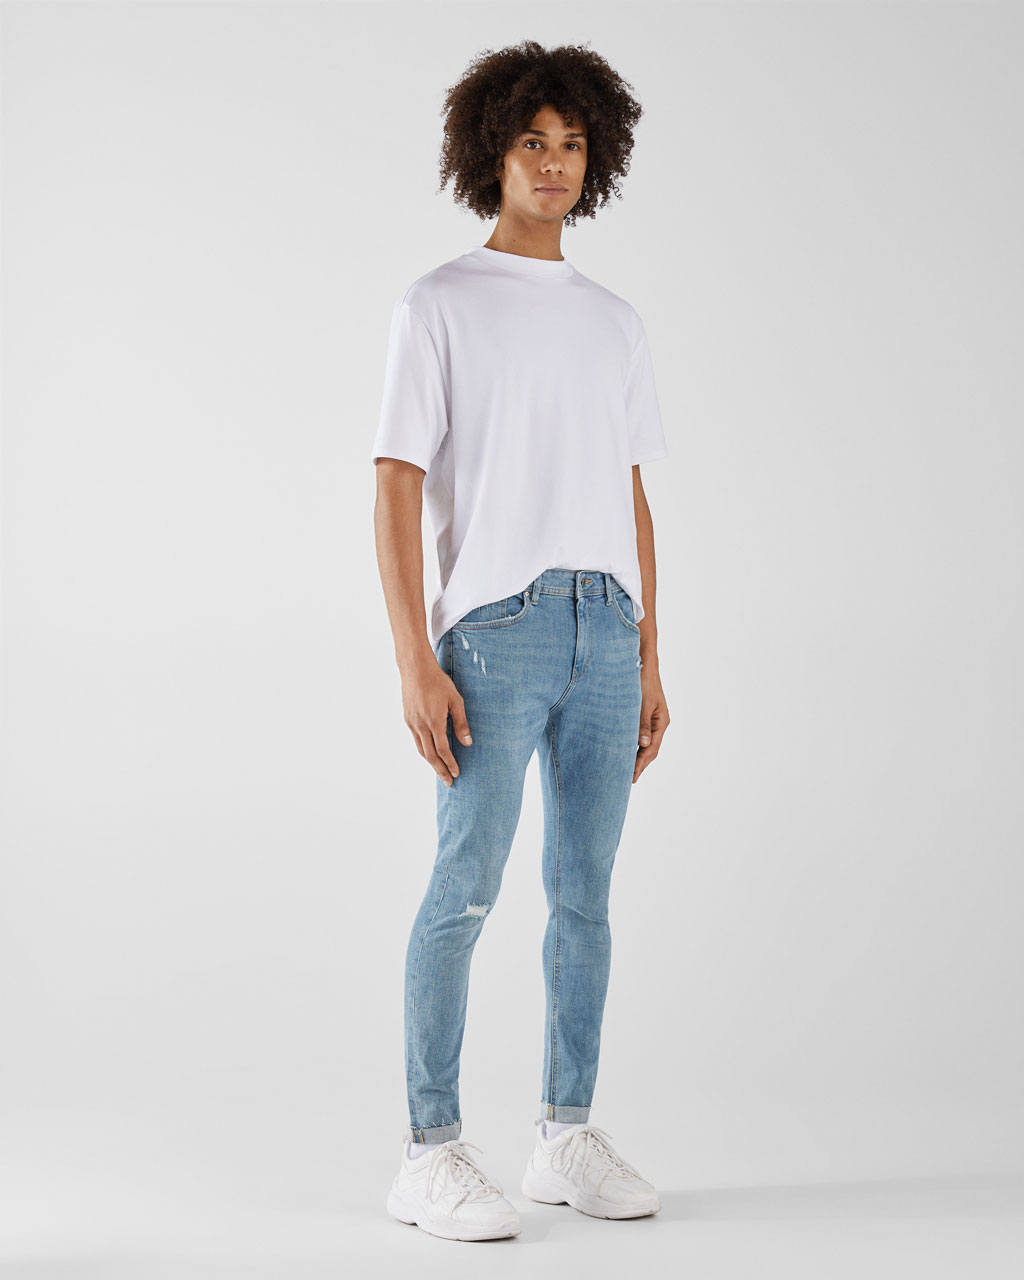 Super Skinny Fit jean